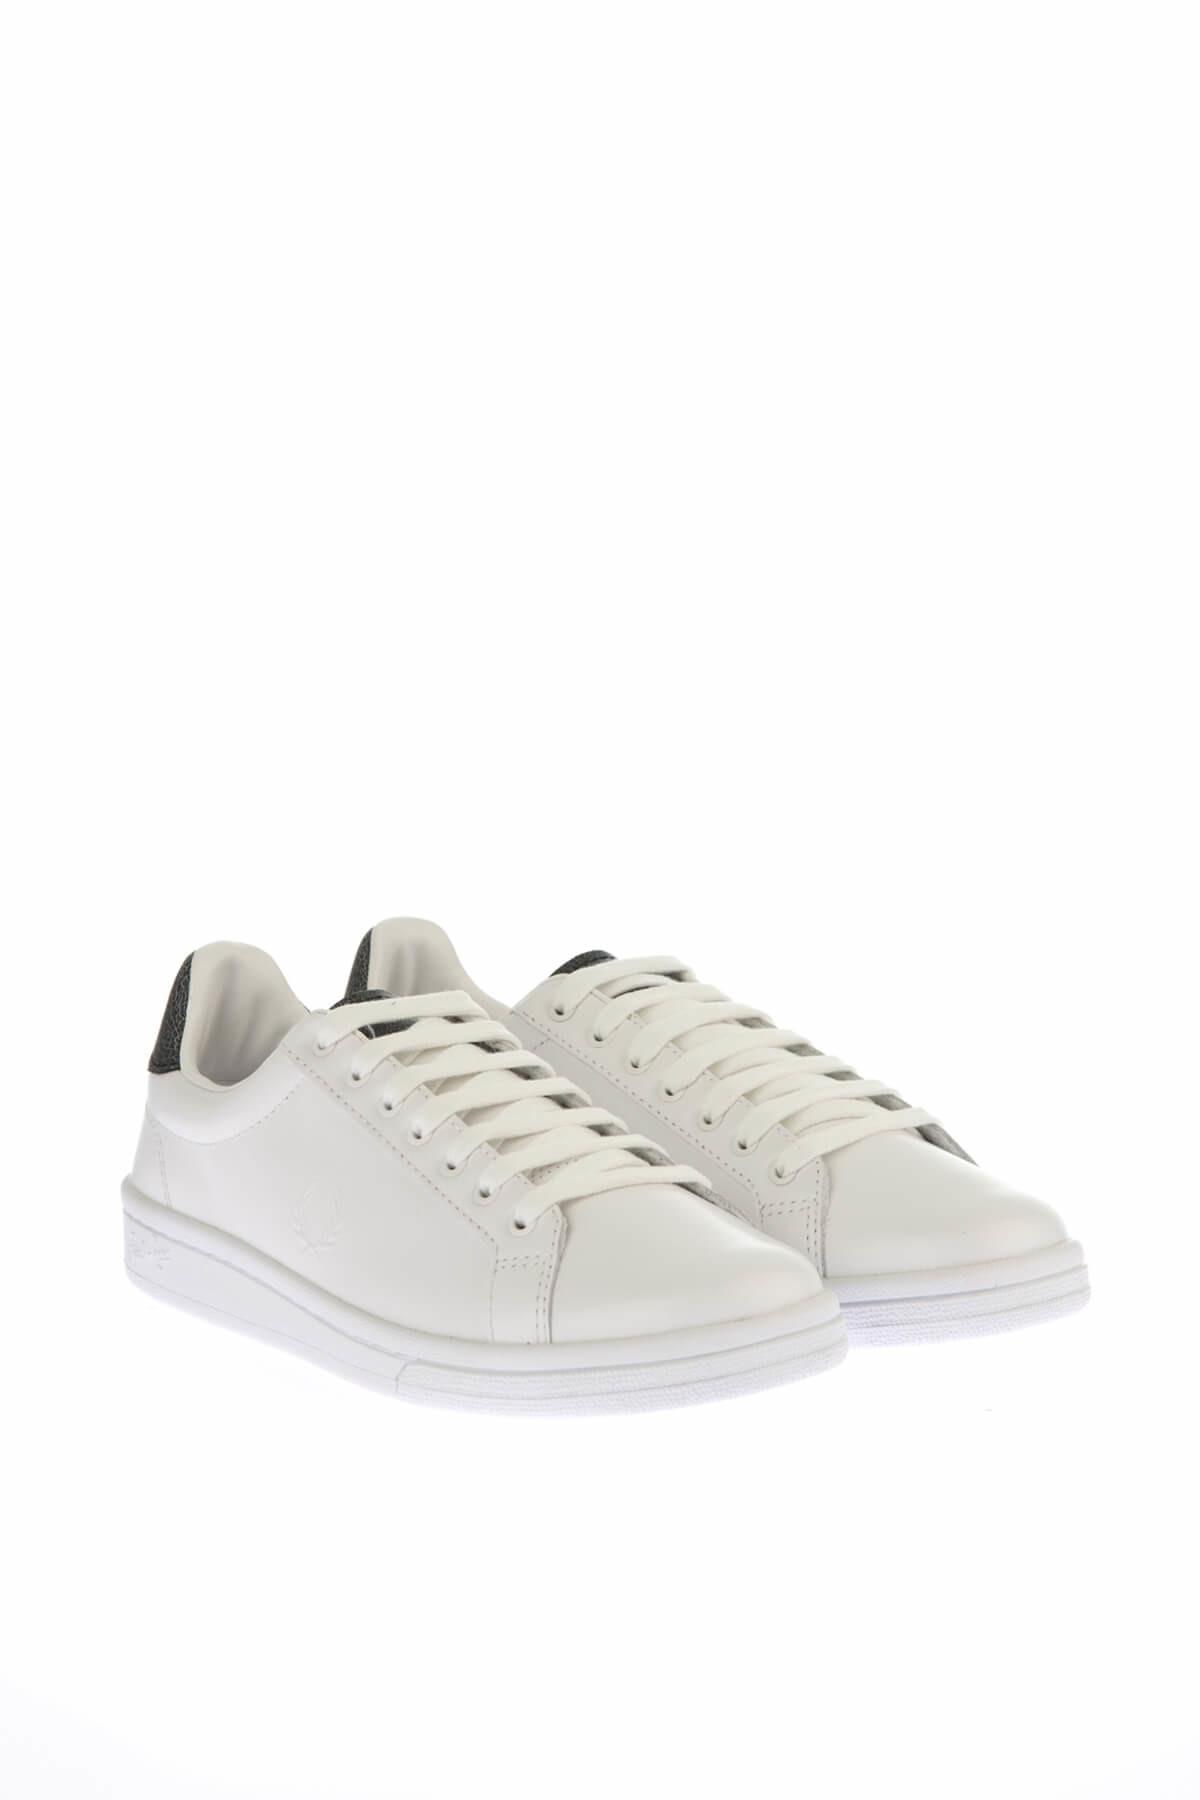 Fred Perry Kadın Beyaz Sneaker 181FRPKAYB3106 2